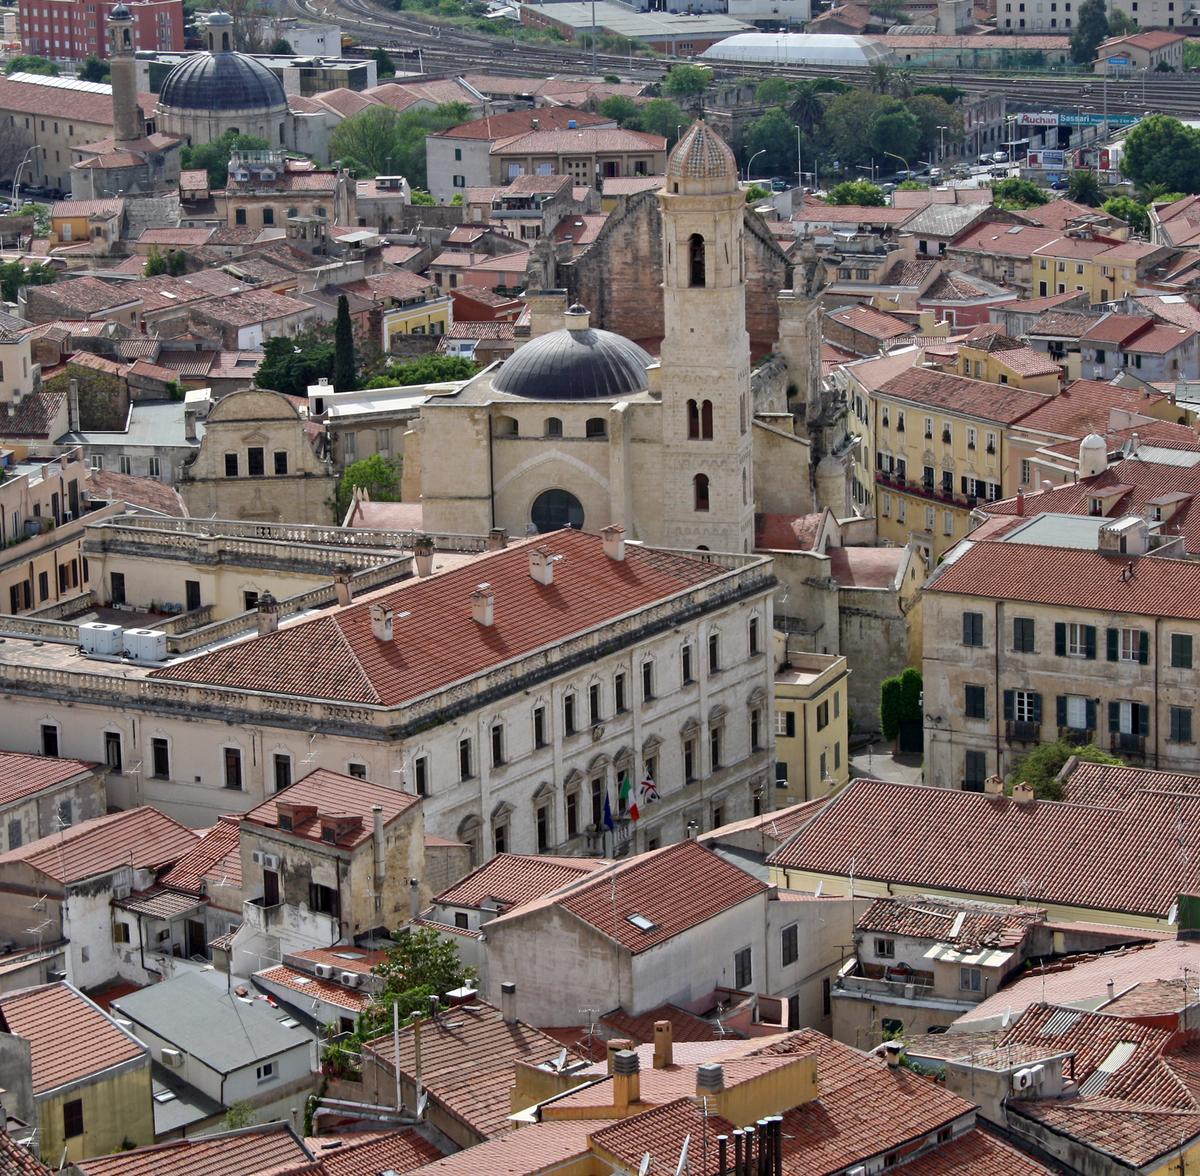 Sassari Travel guide at Wikivoyage